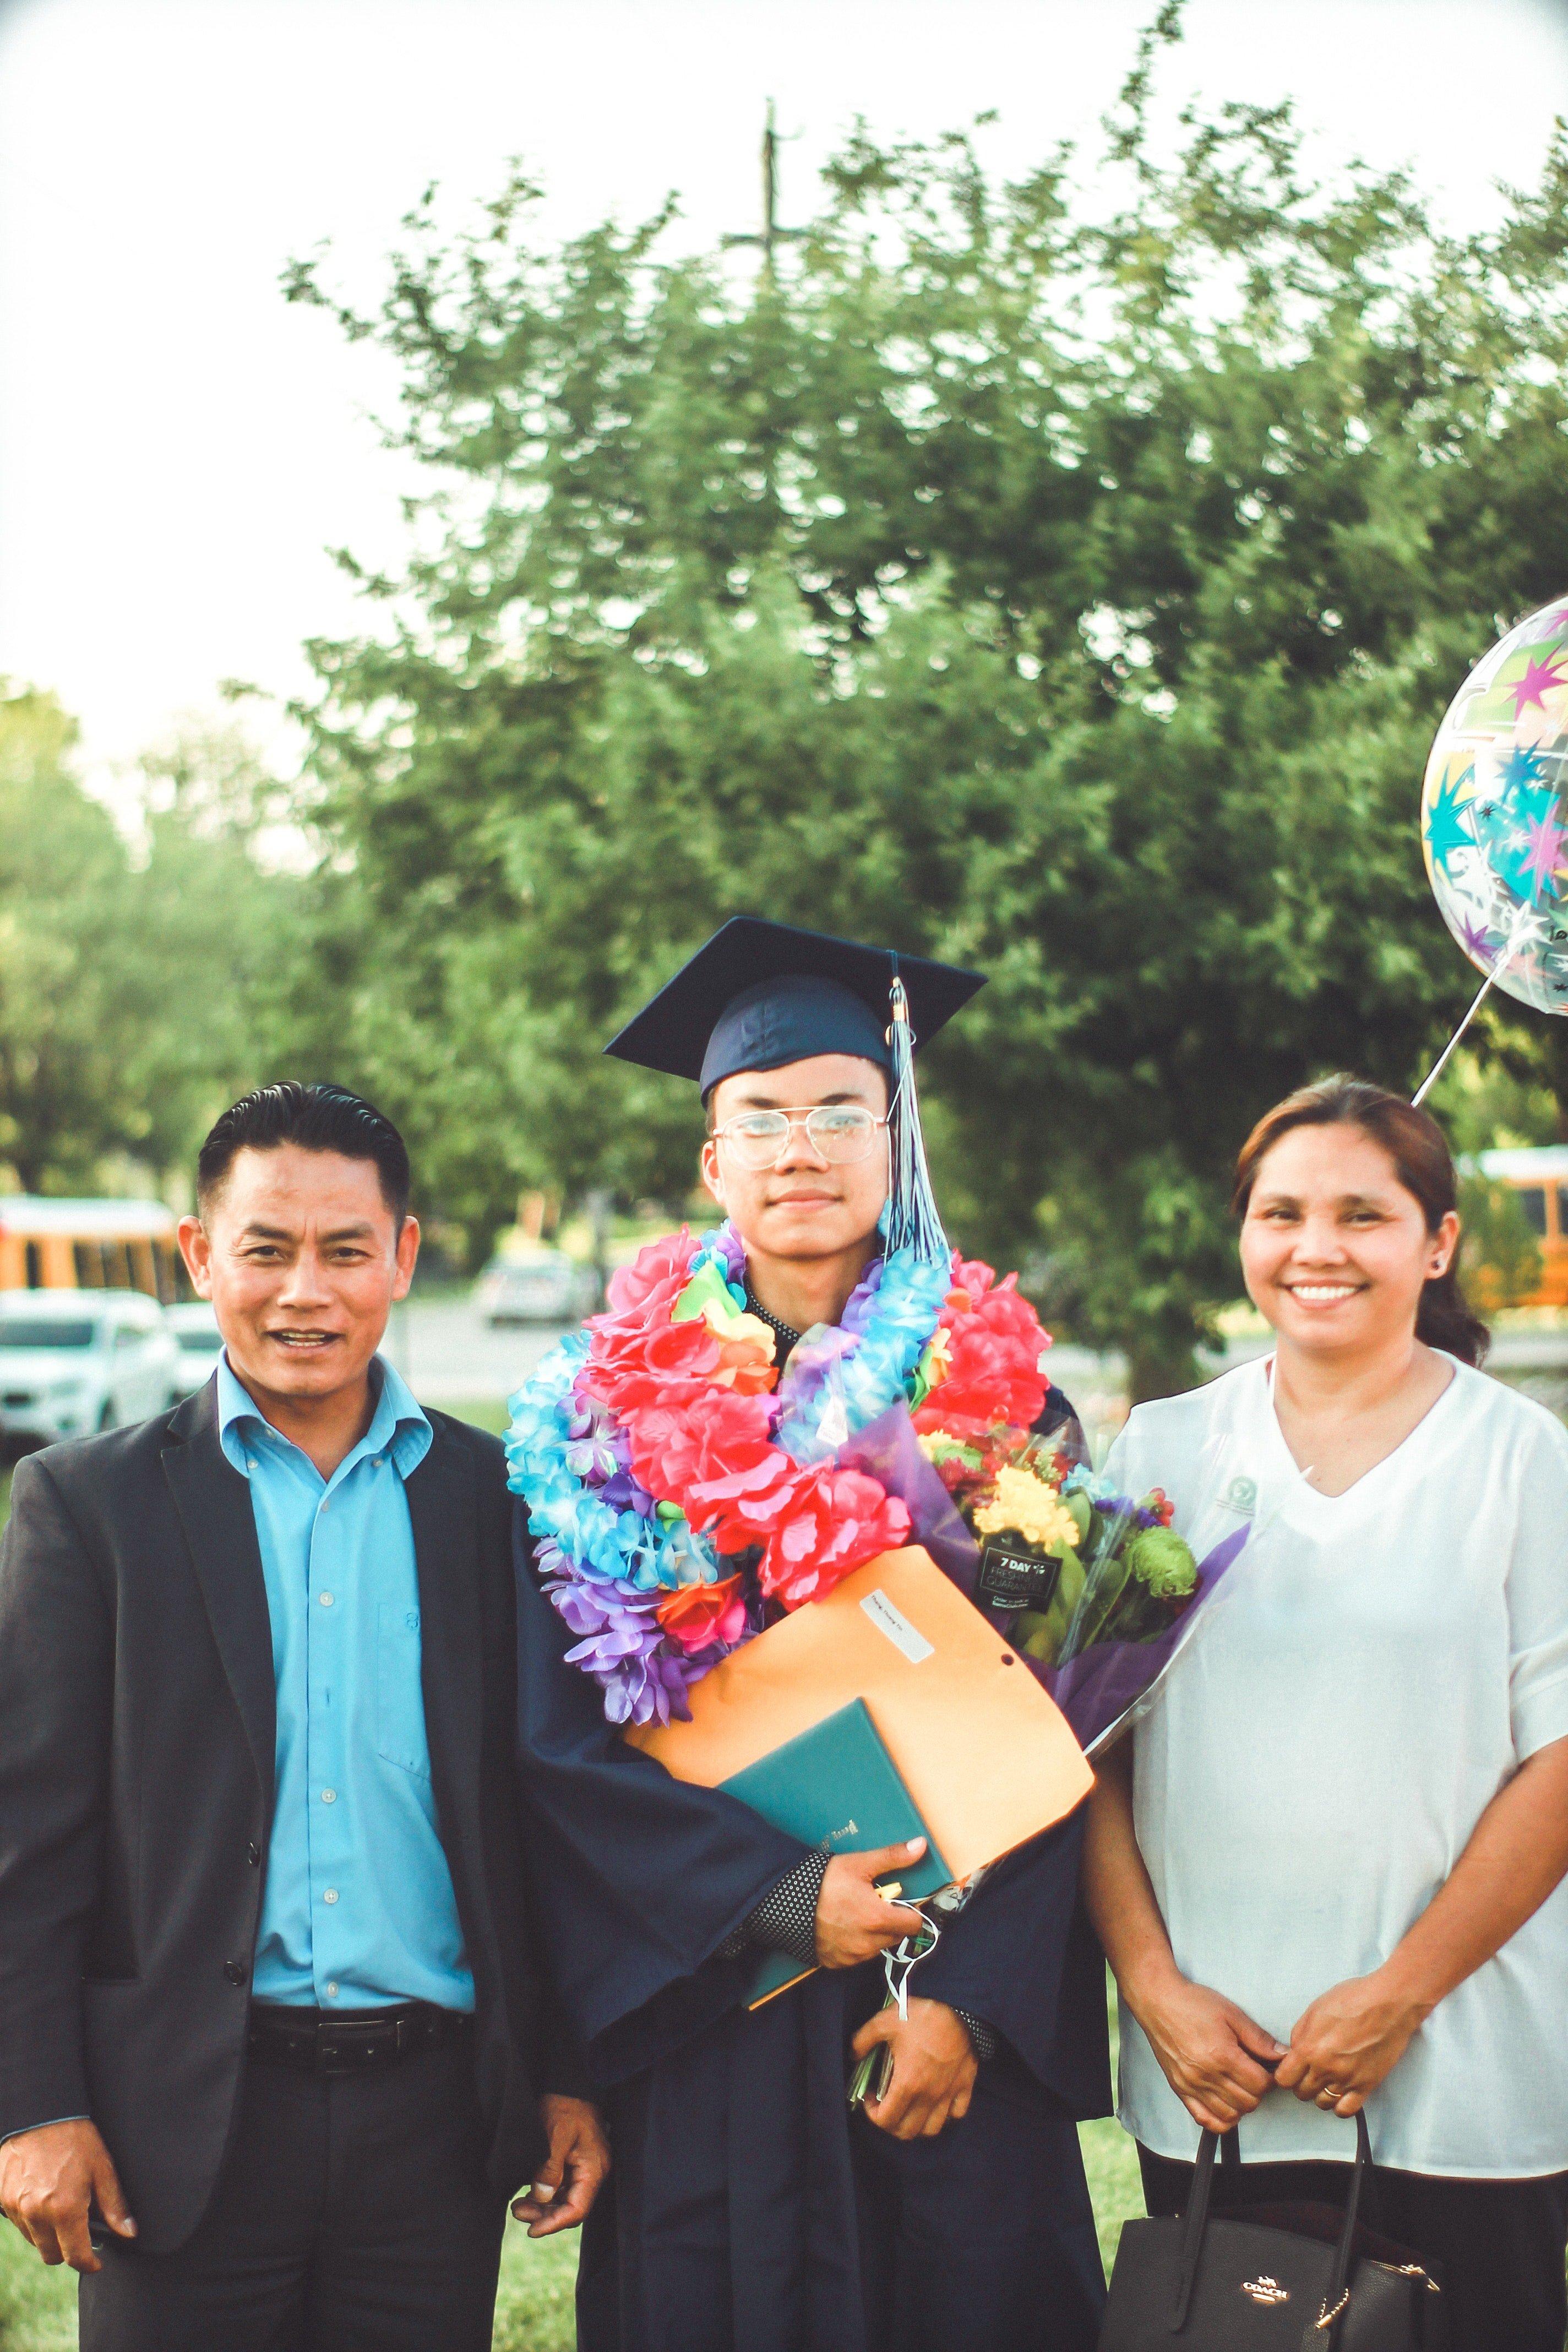 parents and graduate